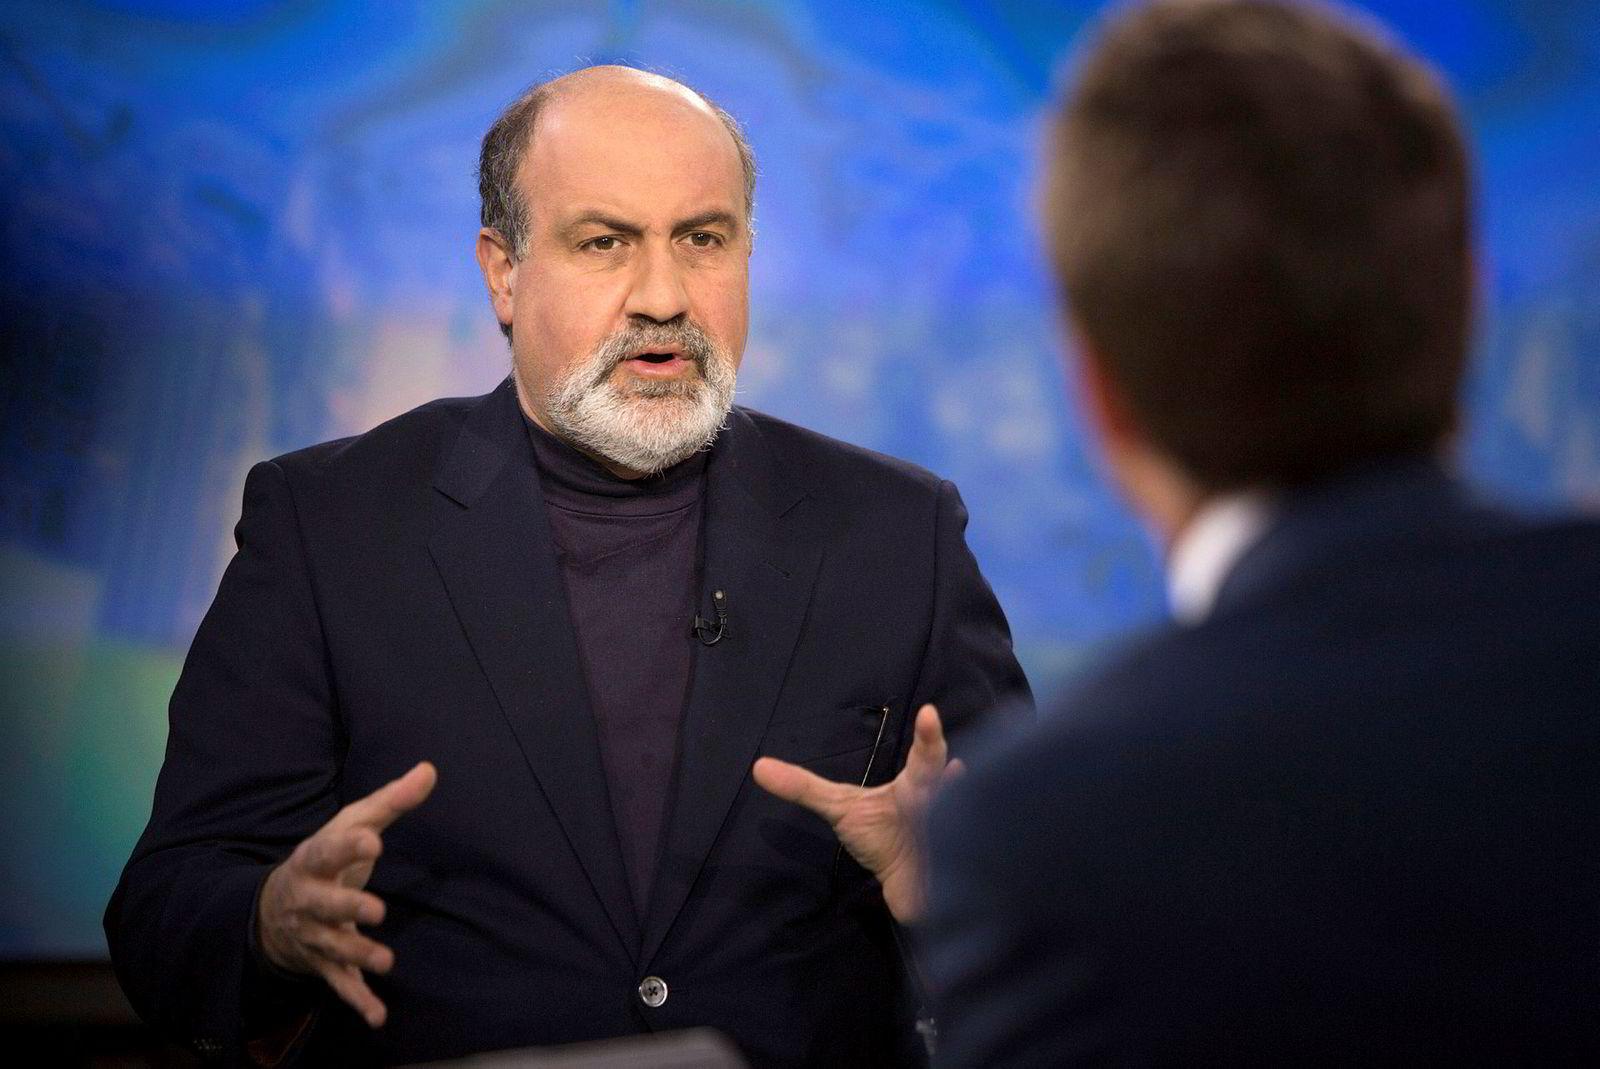 Nassim Nicholas Taleb finansprofessor ved New York University.